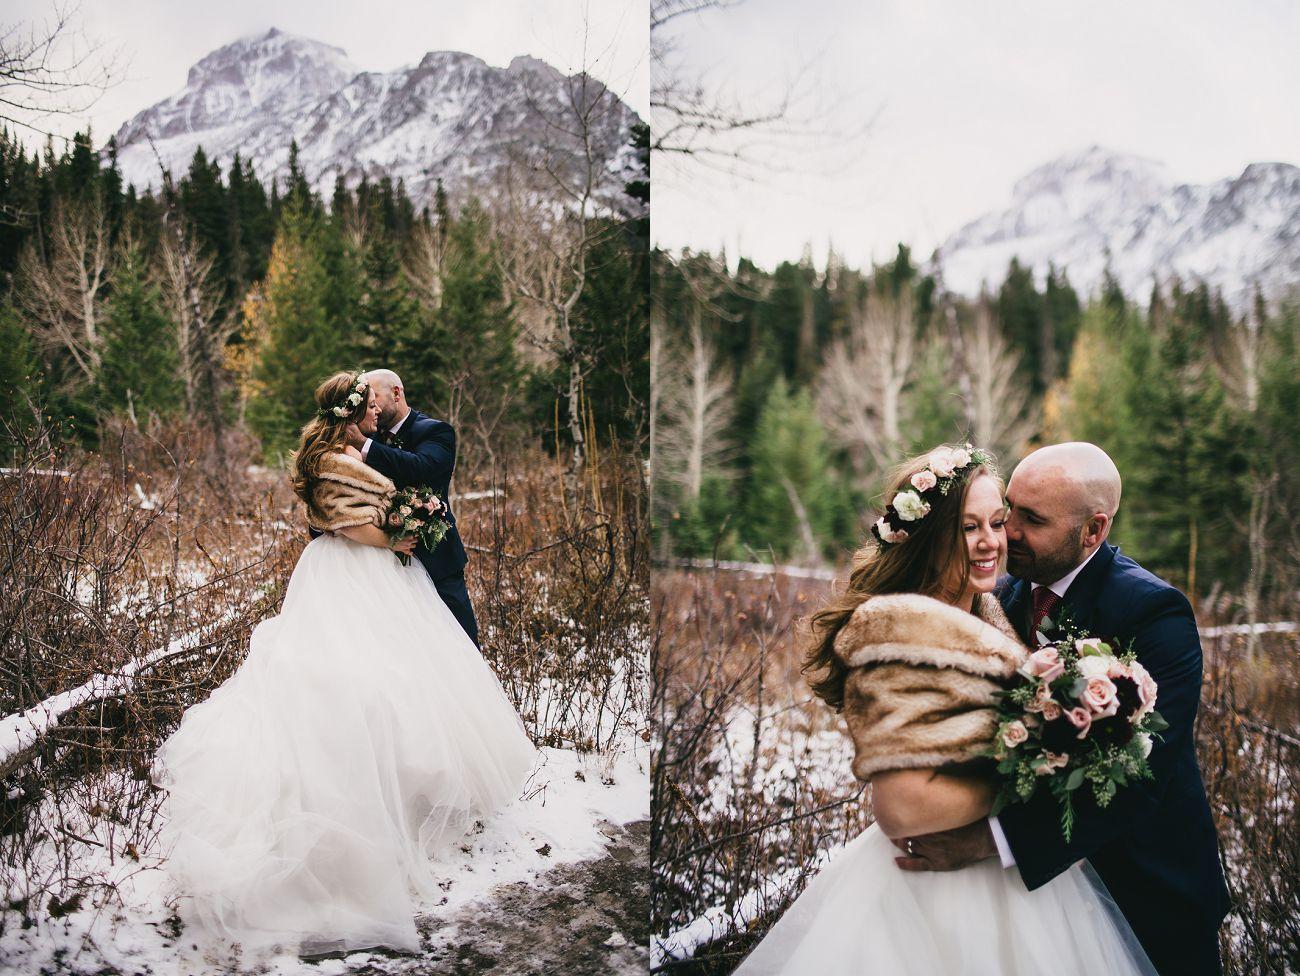 Jennifer_Mooney_Photo_Whitefish_mountain_resort_wedding_elegant_montana_wedding_065.jpg